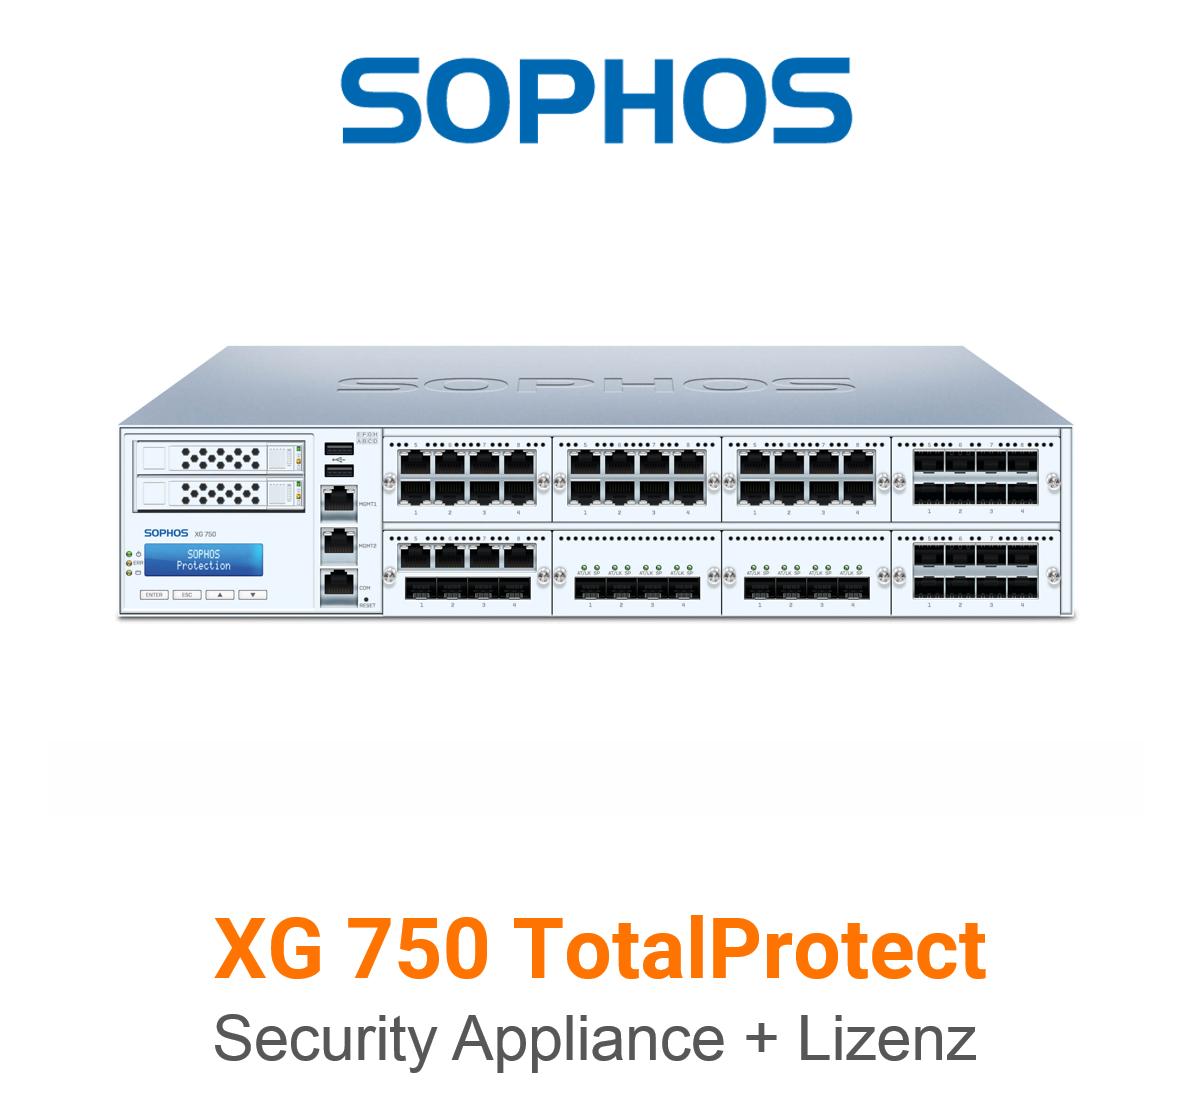 Sophos XG 750 TotalProtect Bundle (Hardware + Lizenz)